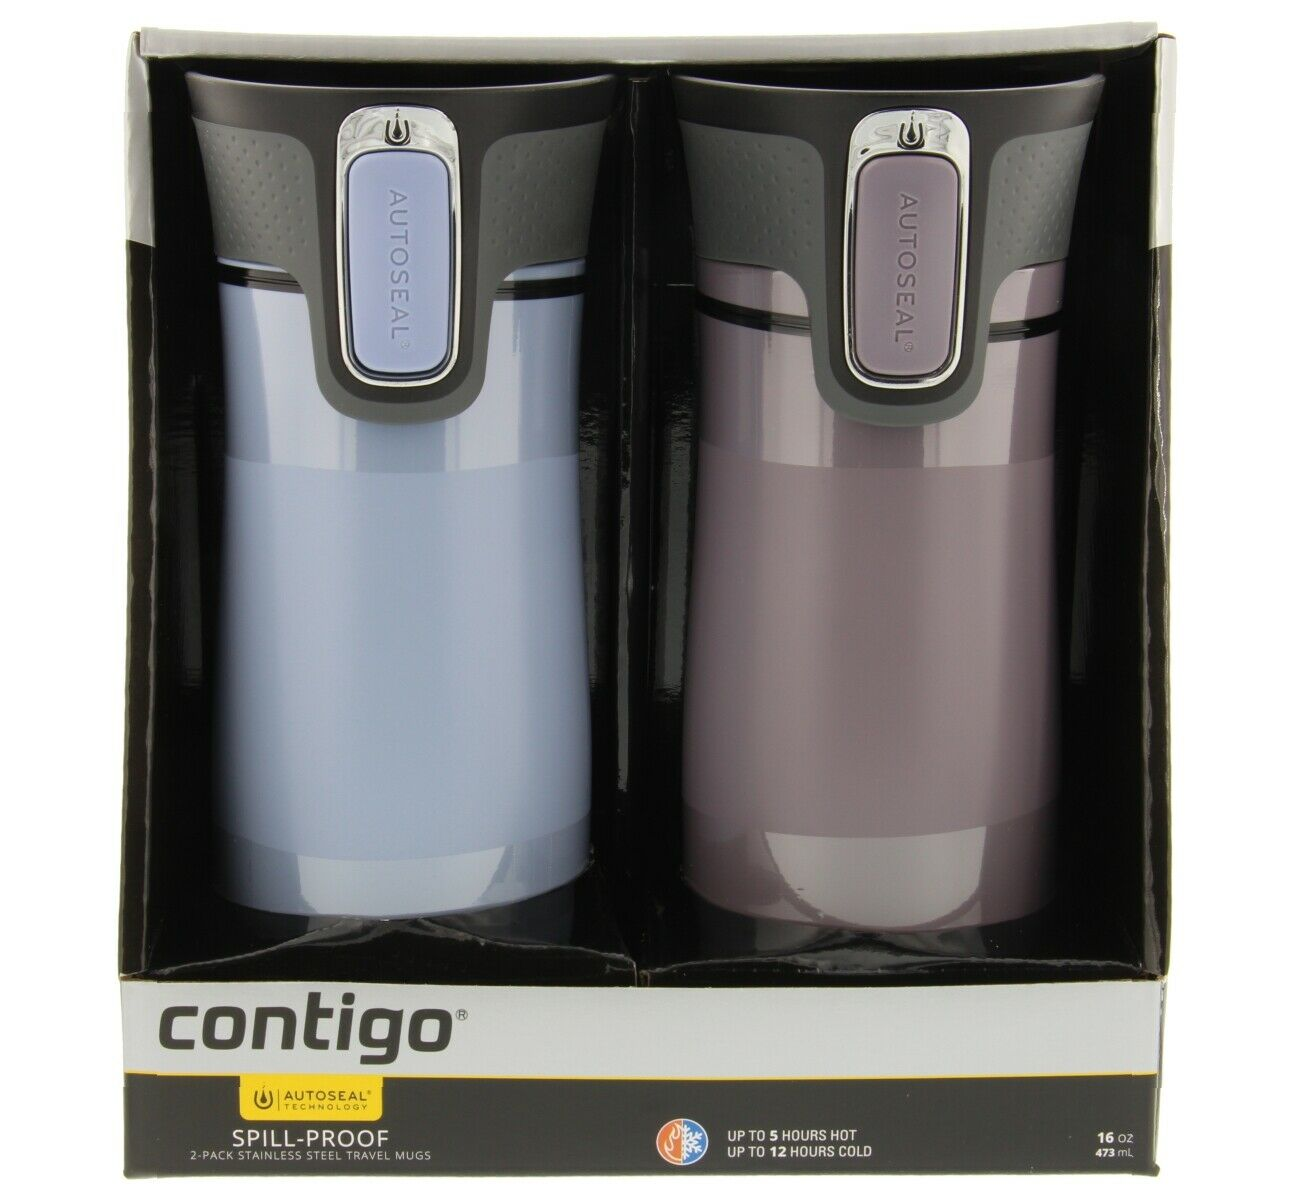 Термостакан Contigo WEST LOOP Dark Plum, объем 0,47 л, светло-сливовый Contigo 2104579 фото 6